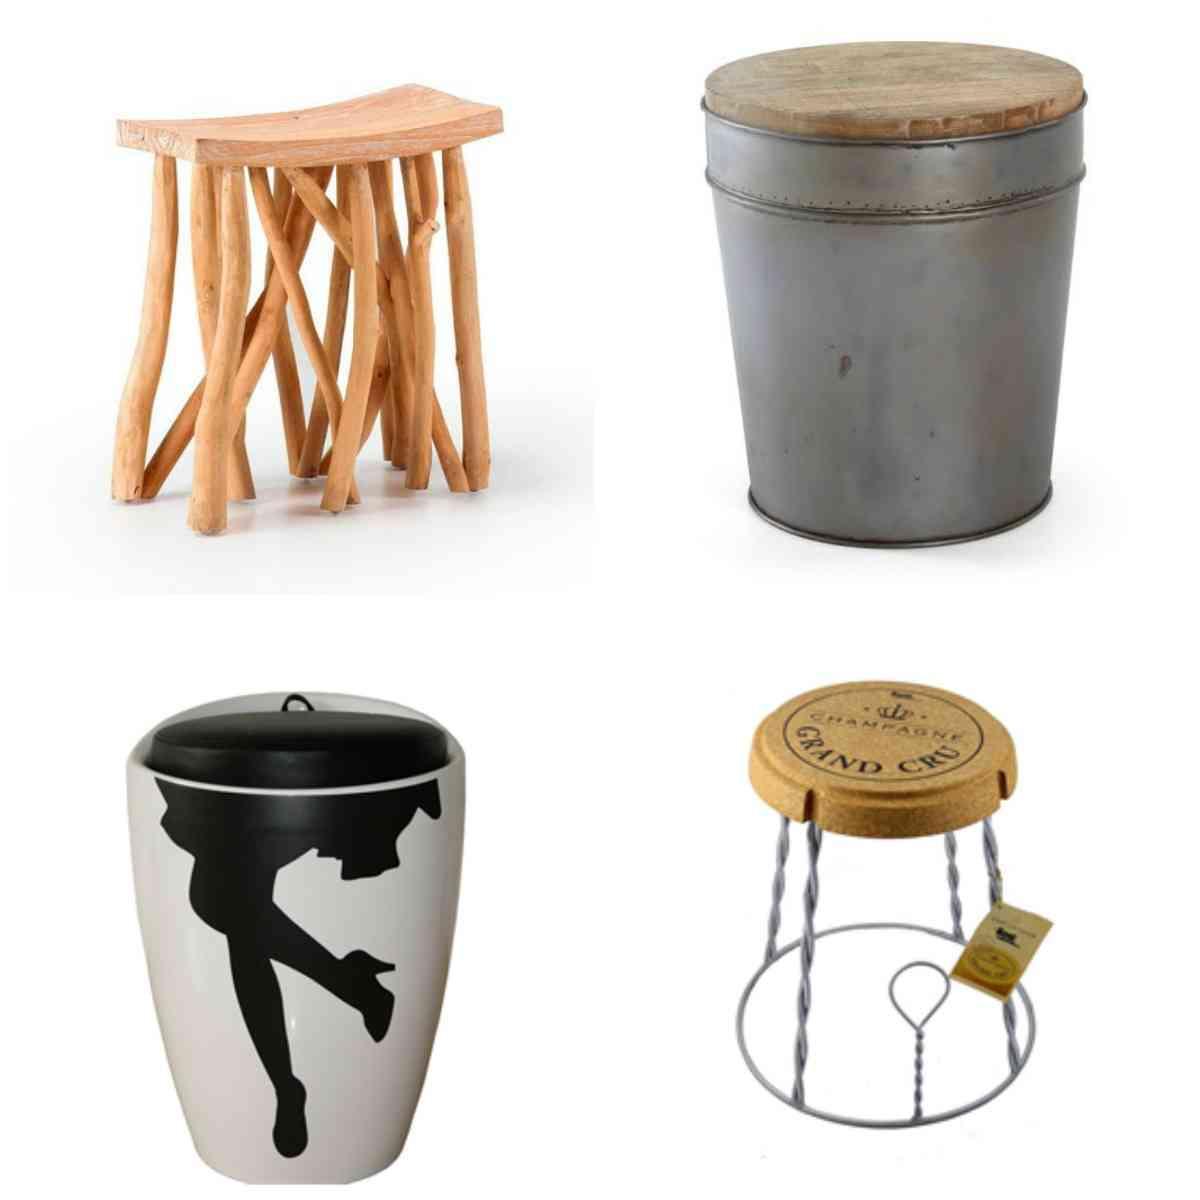 5 taburetes de cocina para crear 5 estilos diferentes - Taburetes de cocina modernos ...